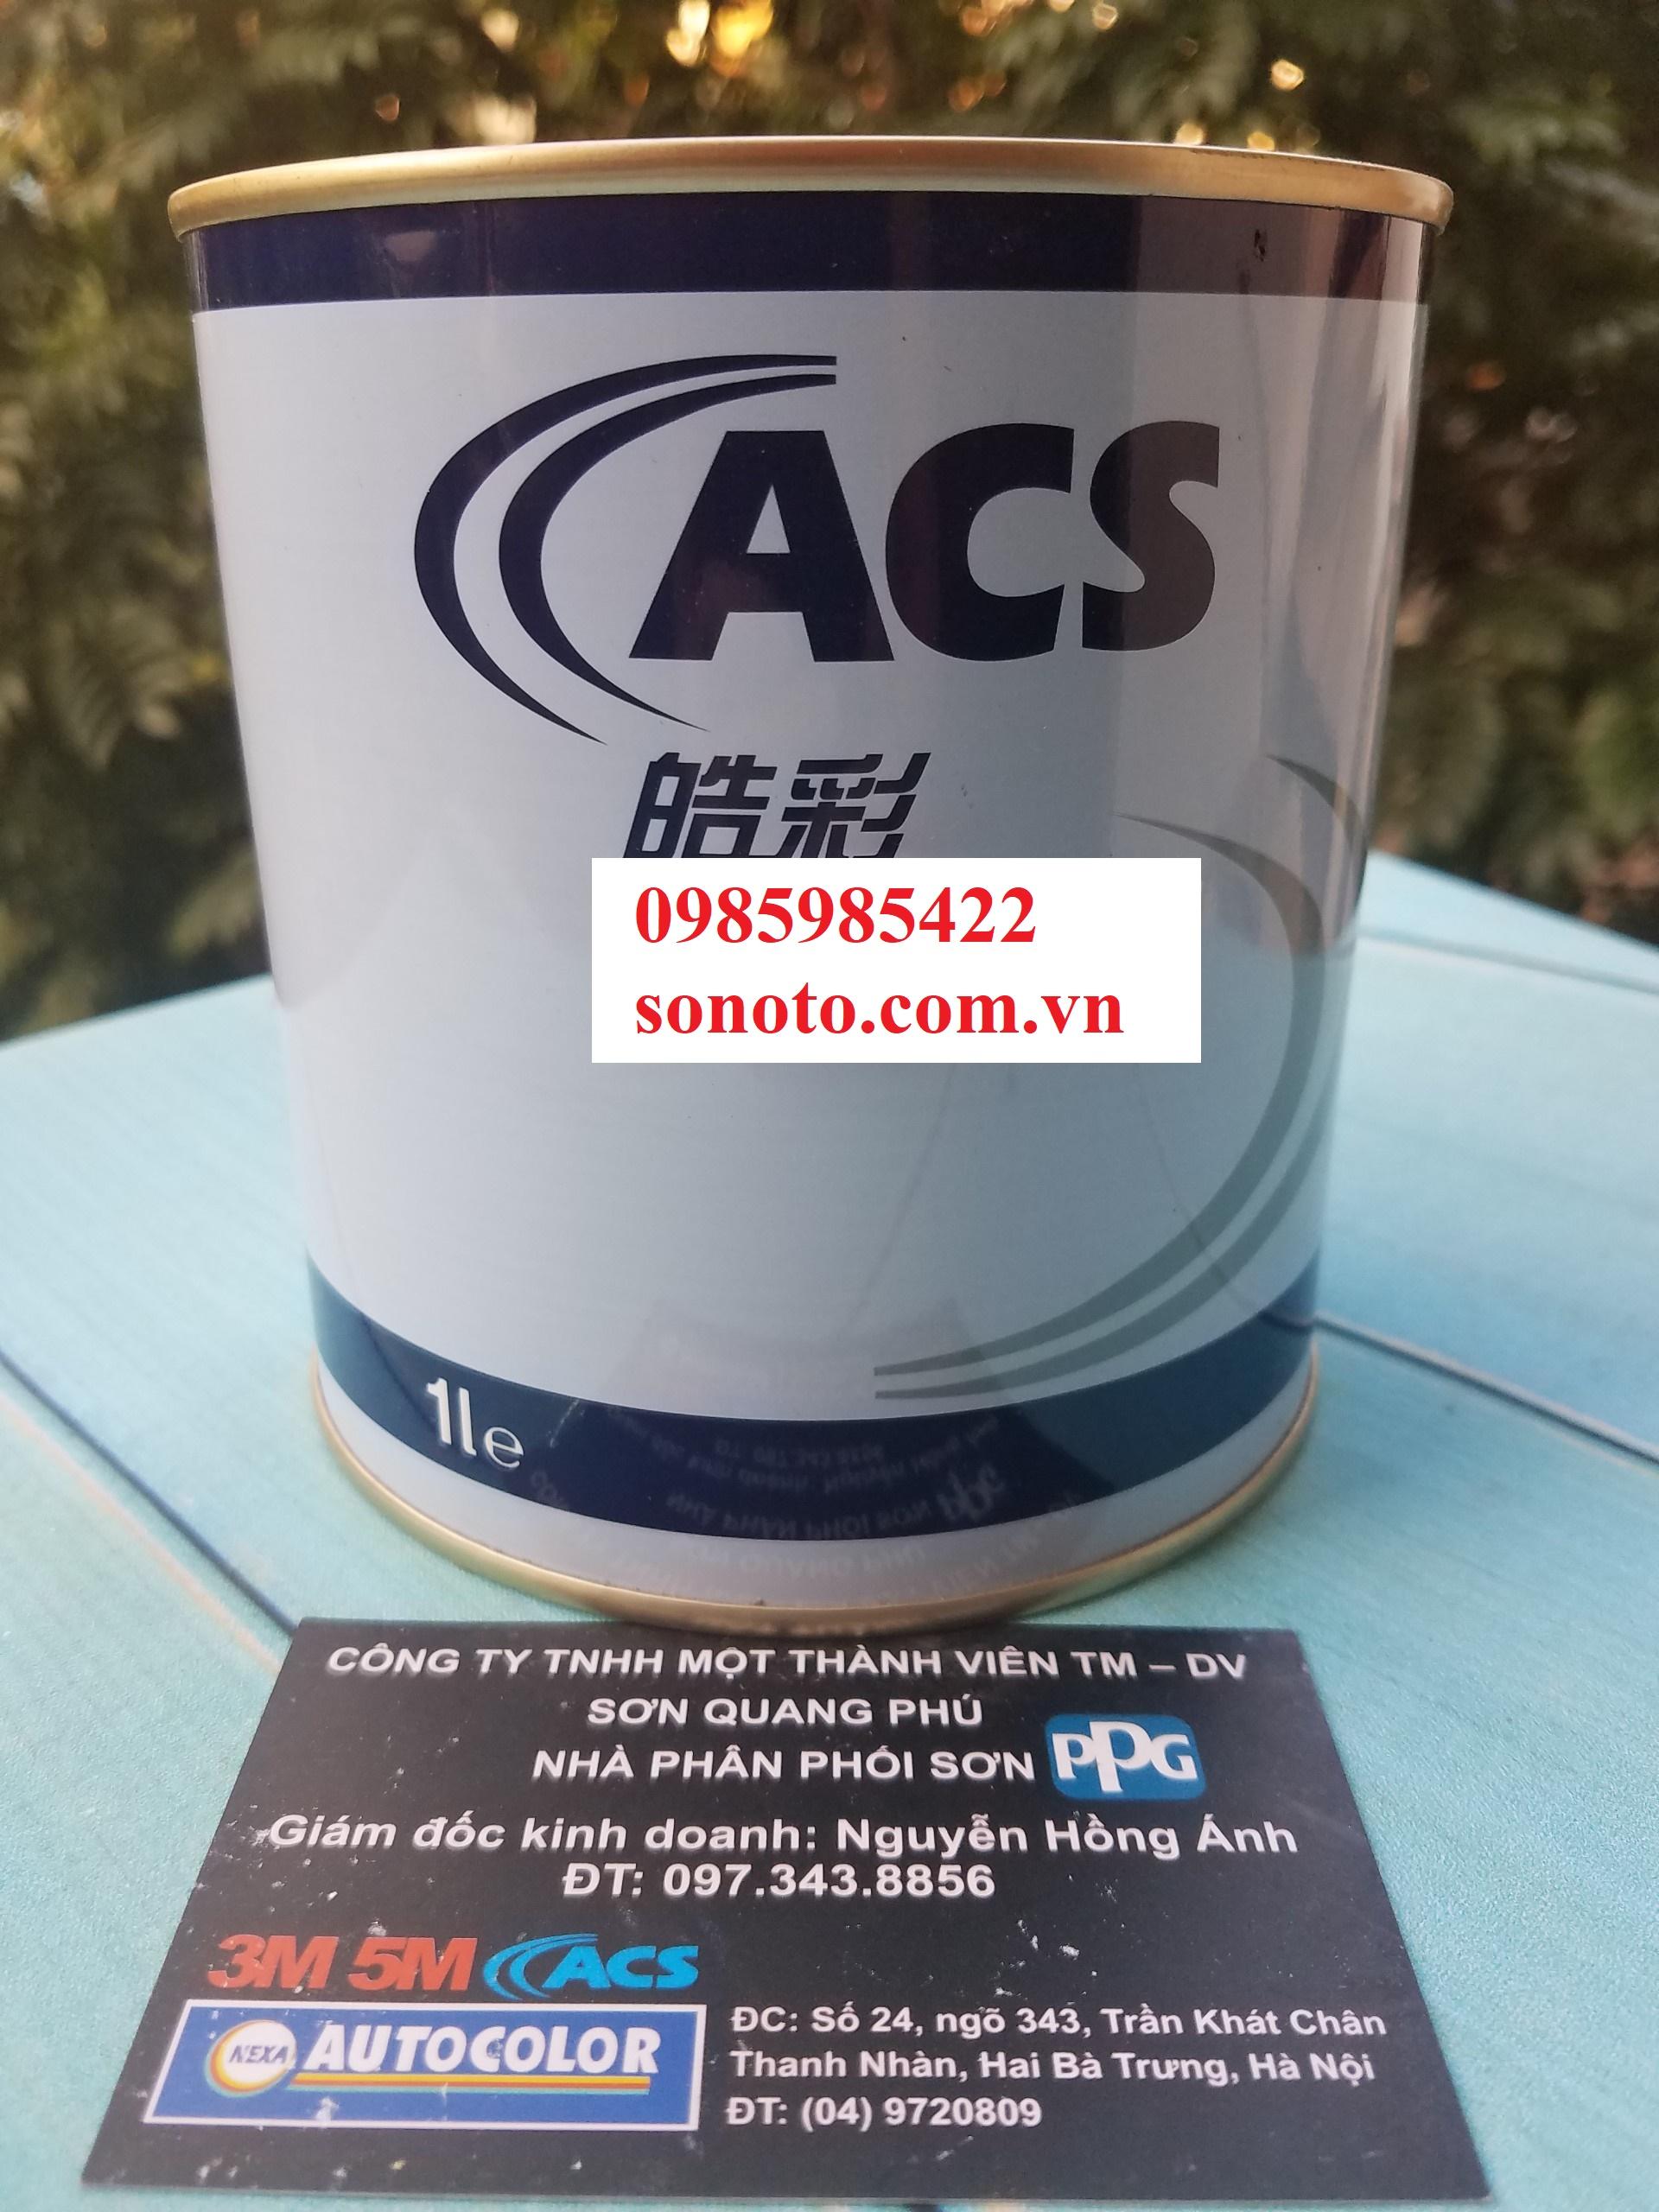 p549-r002-son-goc-2k-giam-cuong-do-mau-den-1-lit-acs